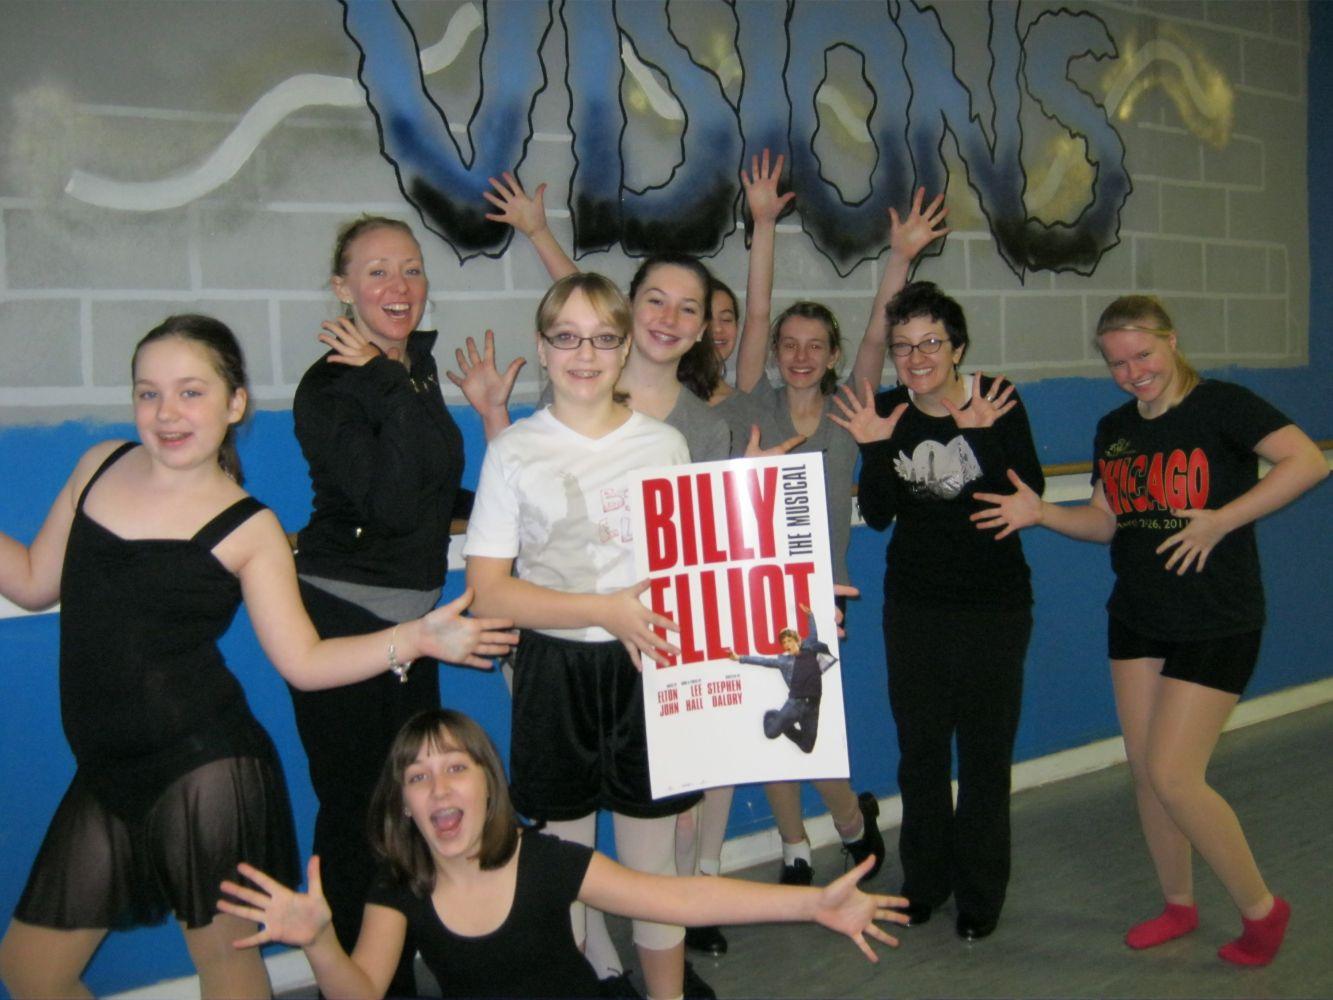 Visions Dance Studio Inc images